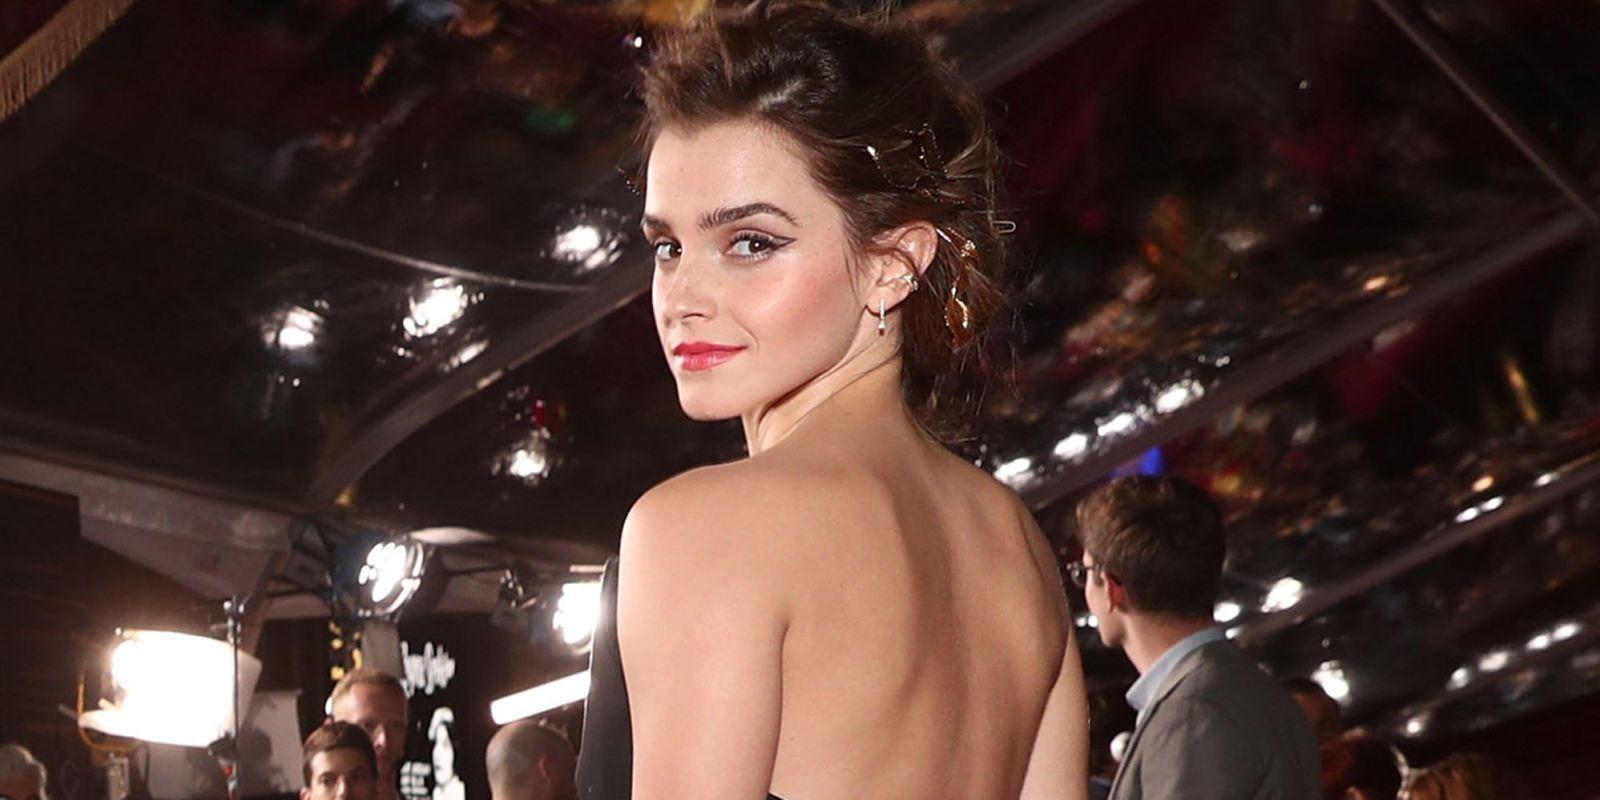 Naked beautiful women model